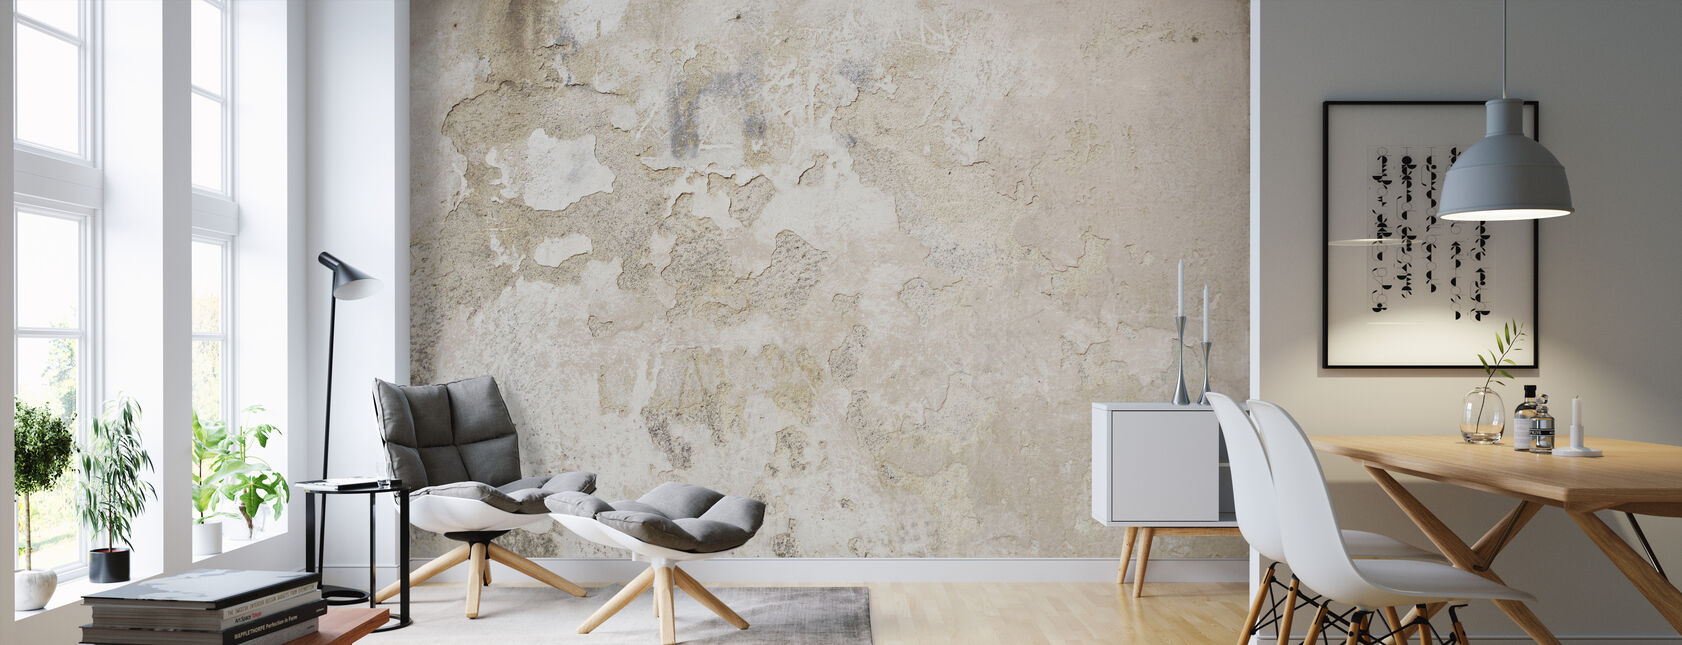 Light Street Wall - Tapete - Wohnzimmer